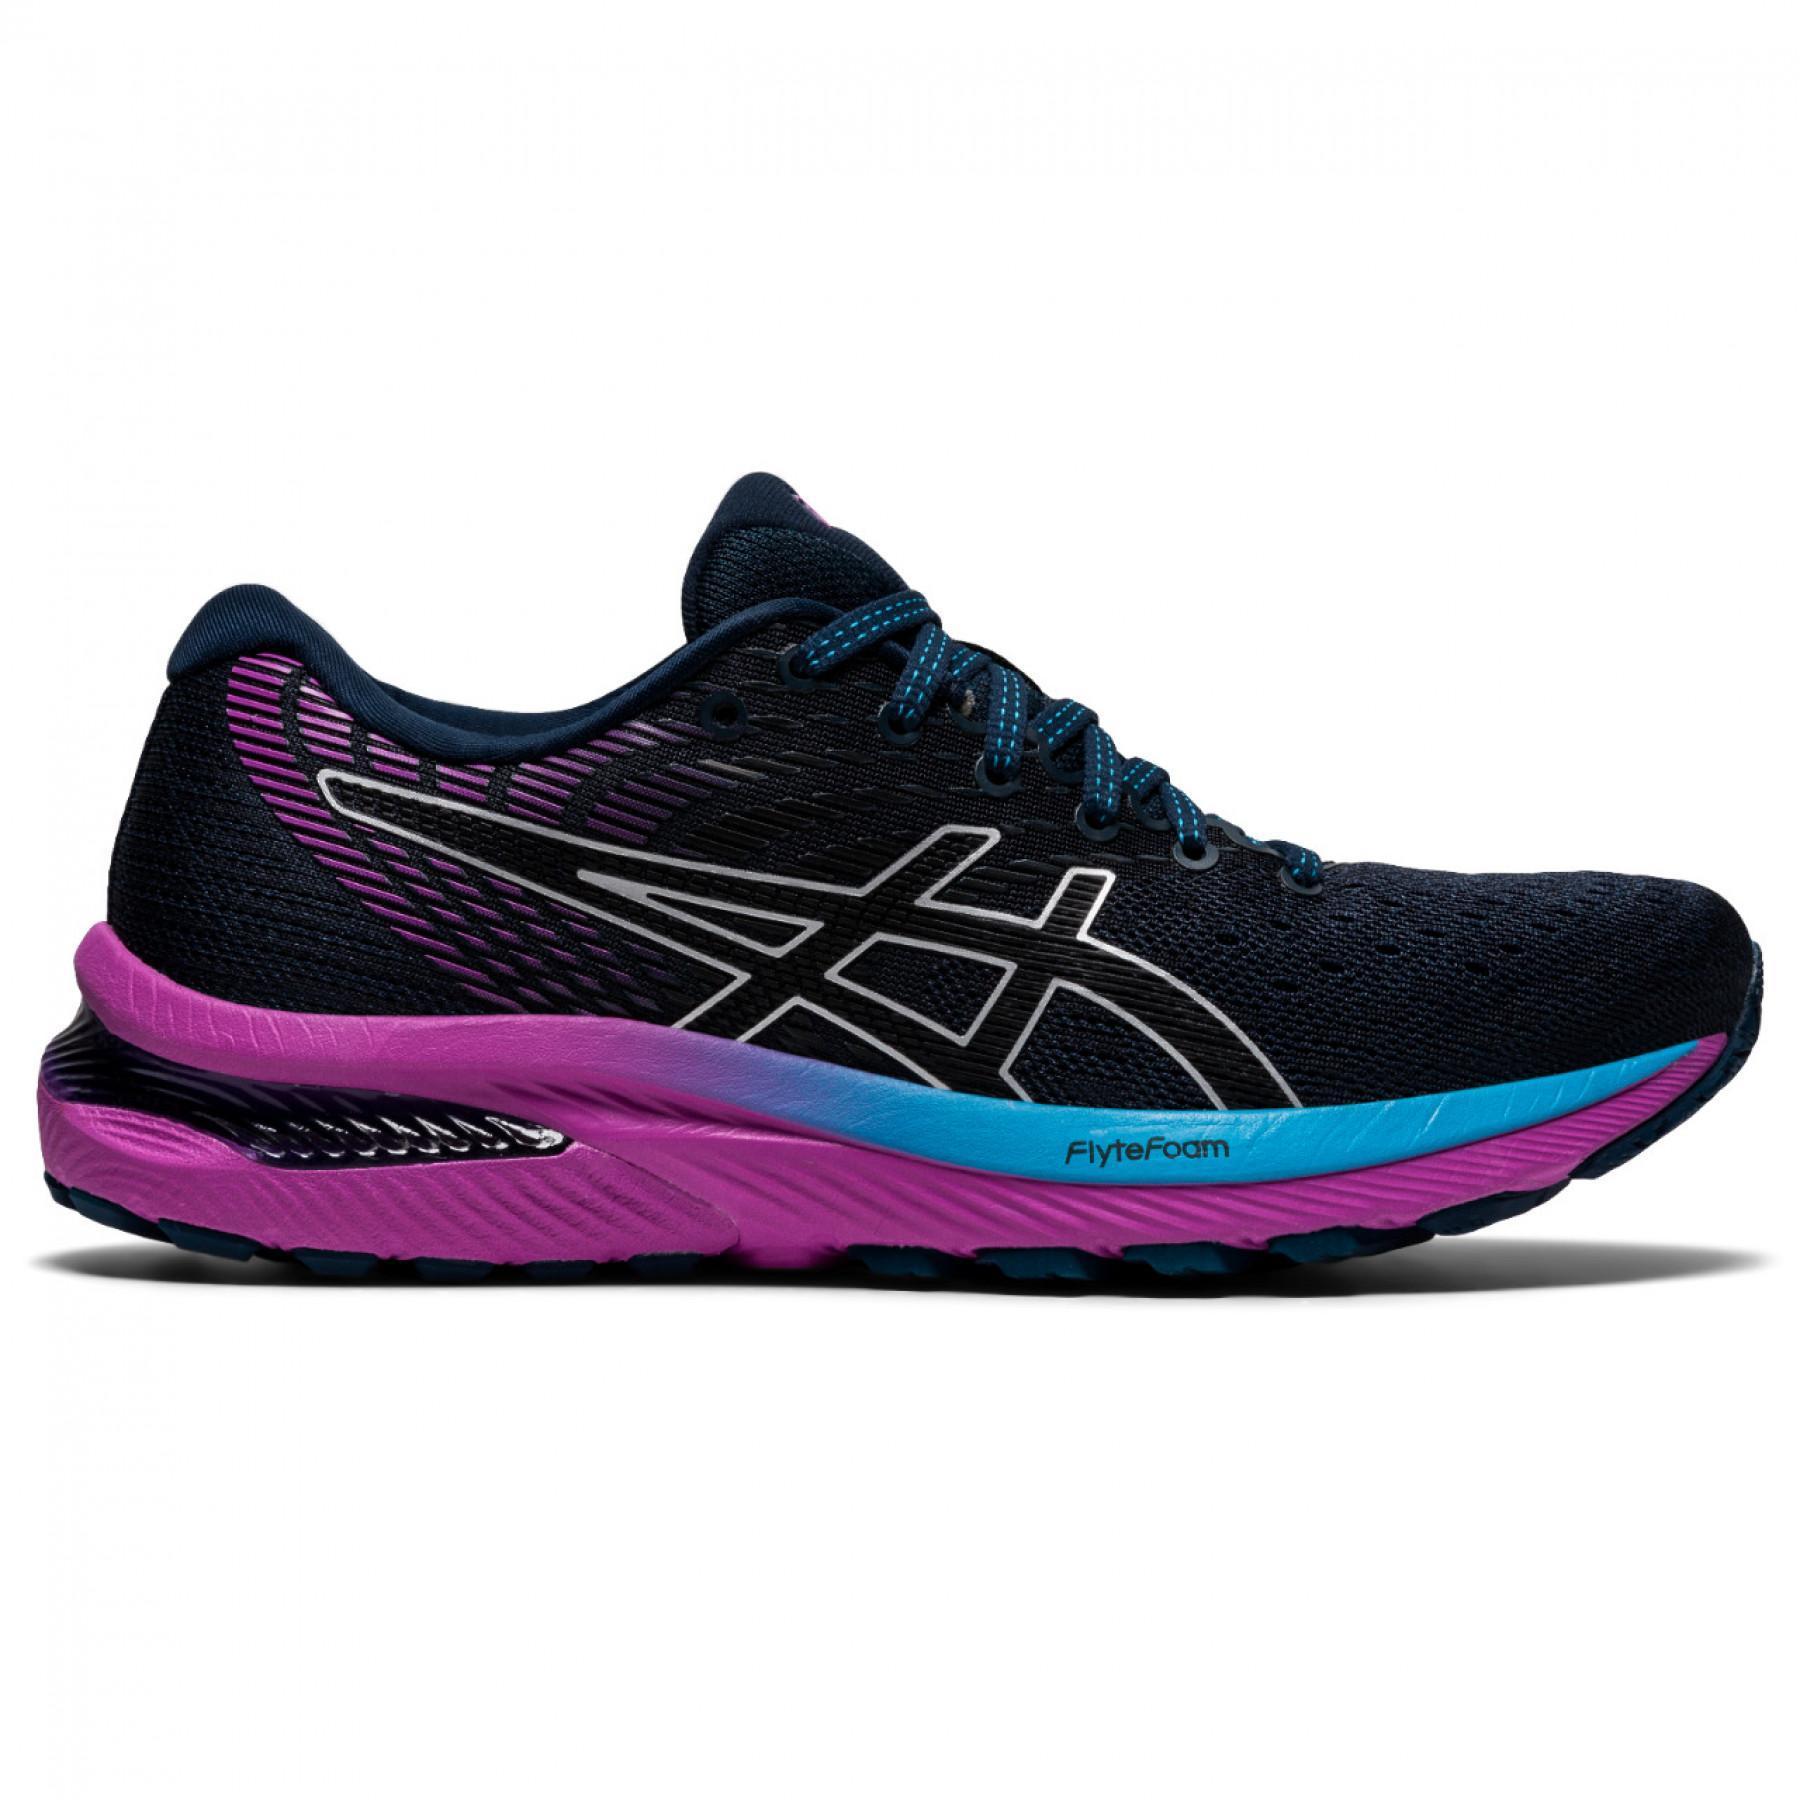 Asics Gel-Cumulus 22 Women's Shoes